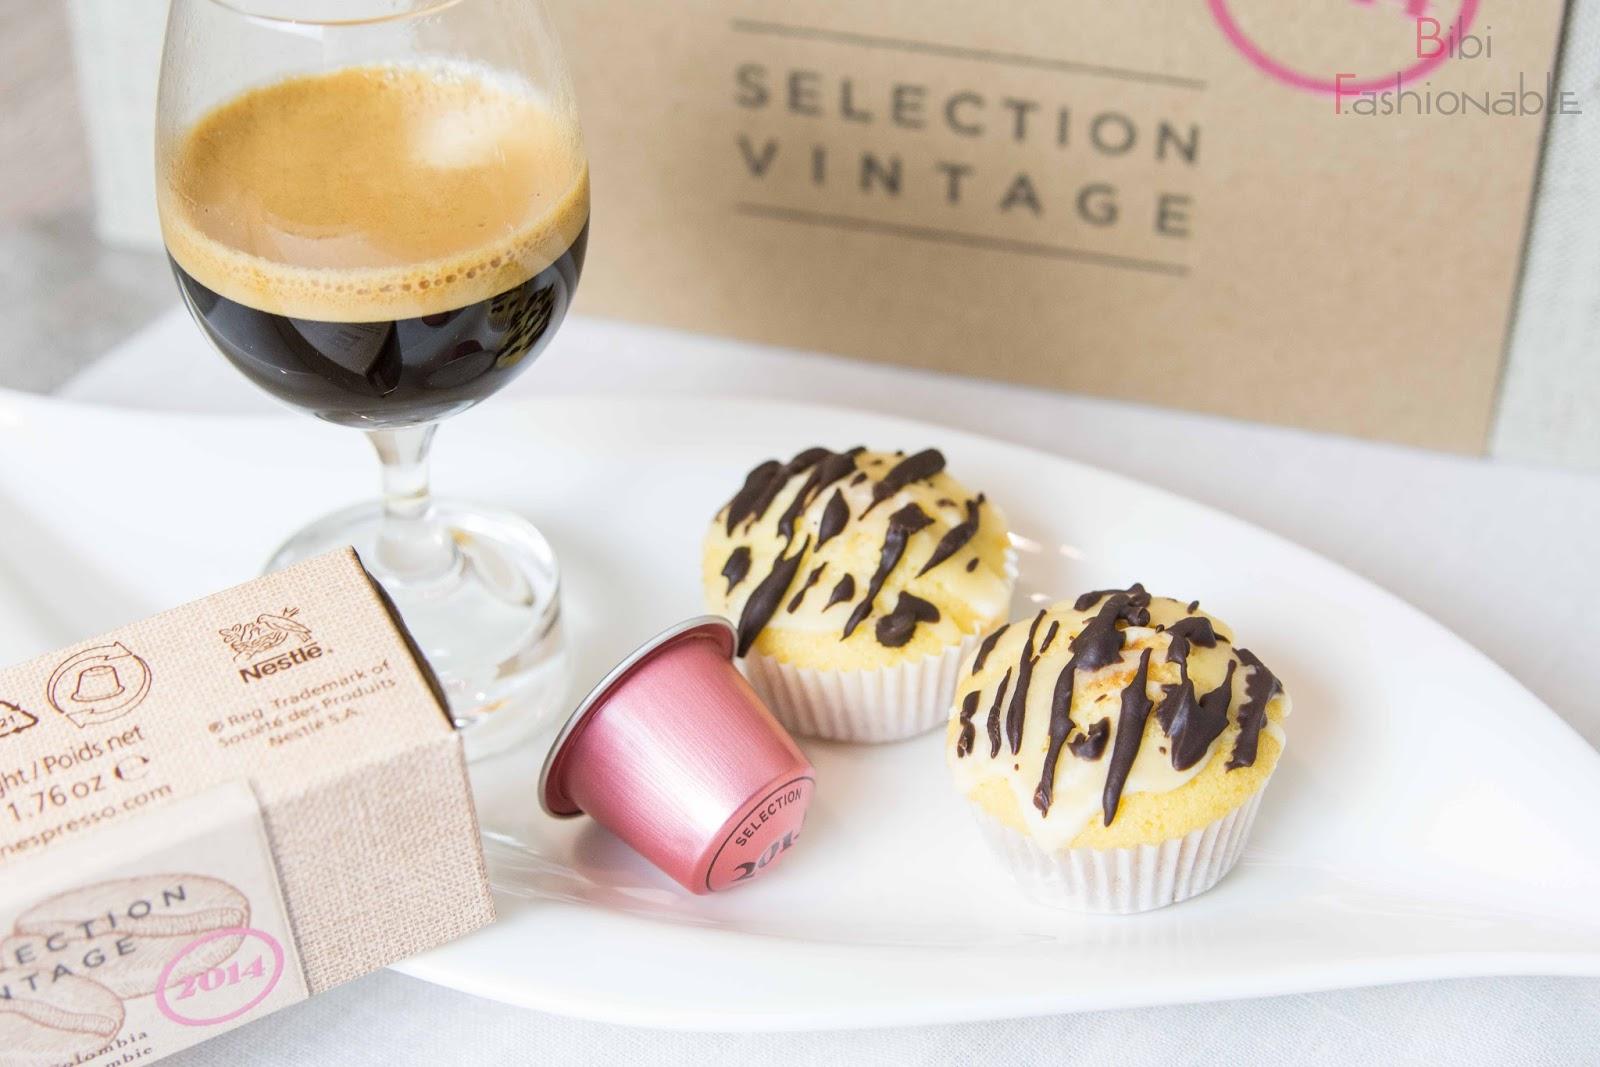 Selection Vintage 2014 Kaffee mini Eierlikör Muffins nah